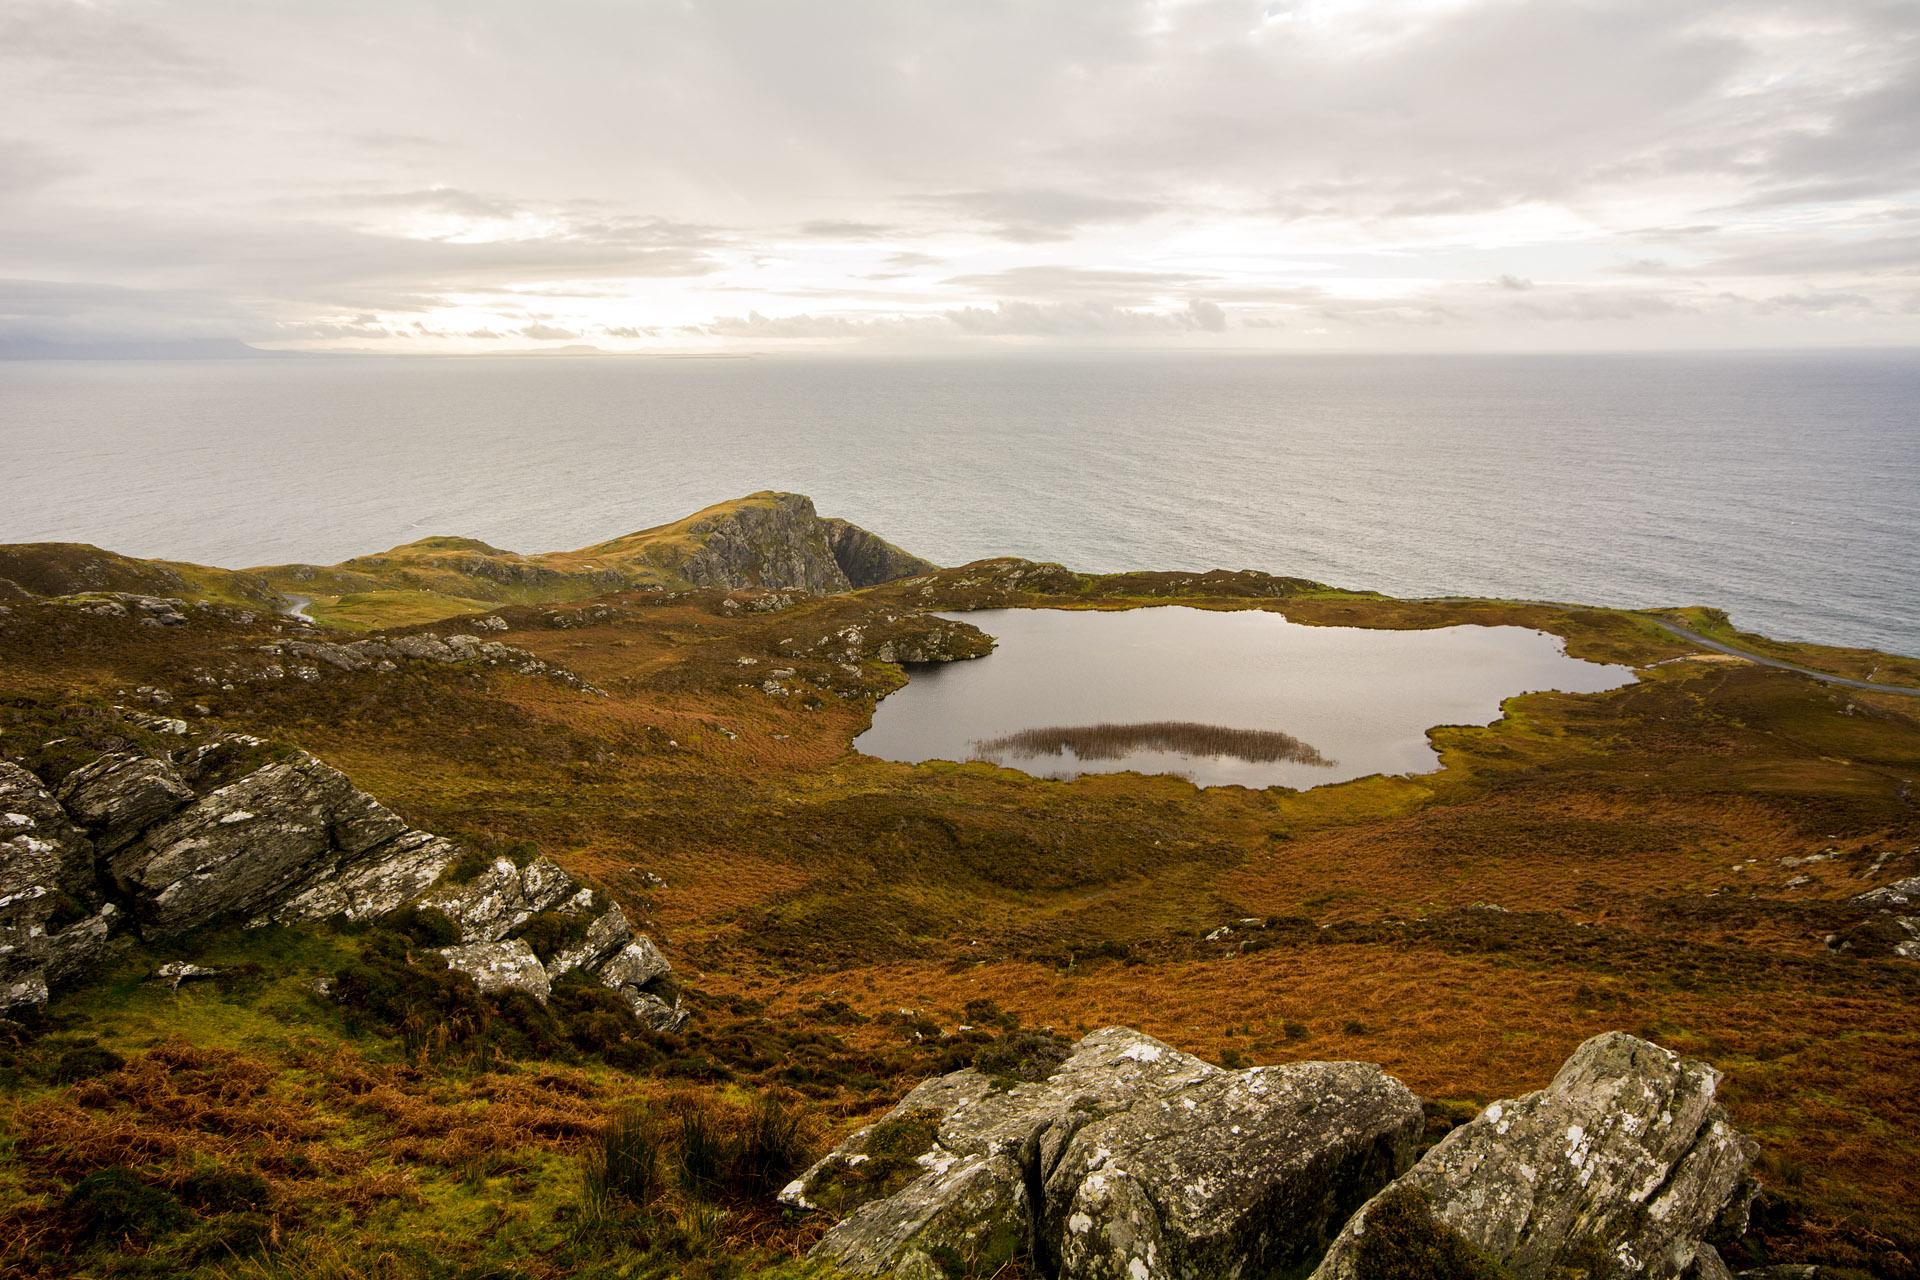 Lough O'Mulligan